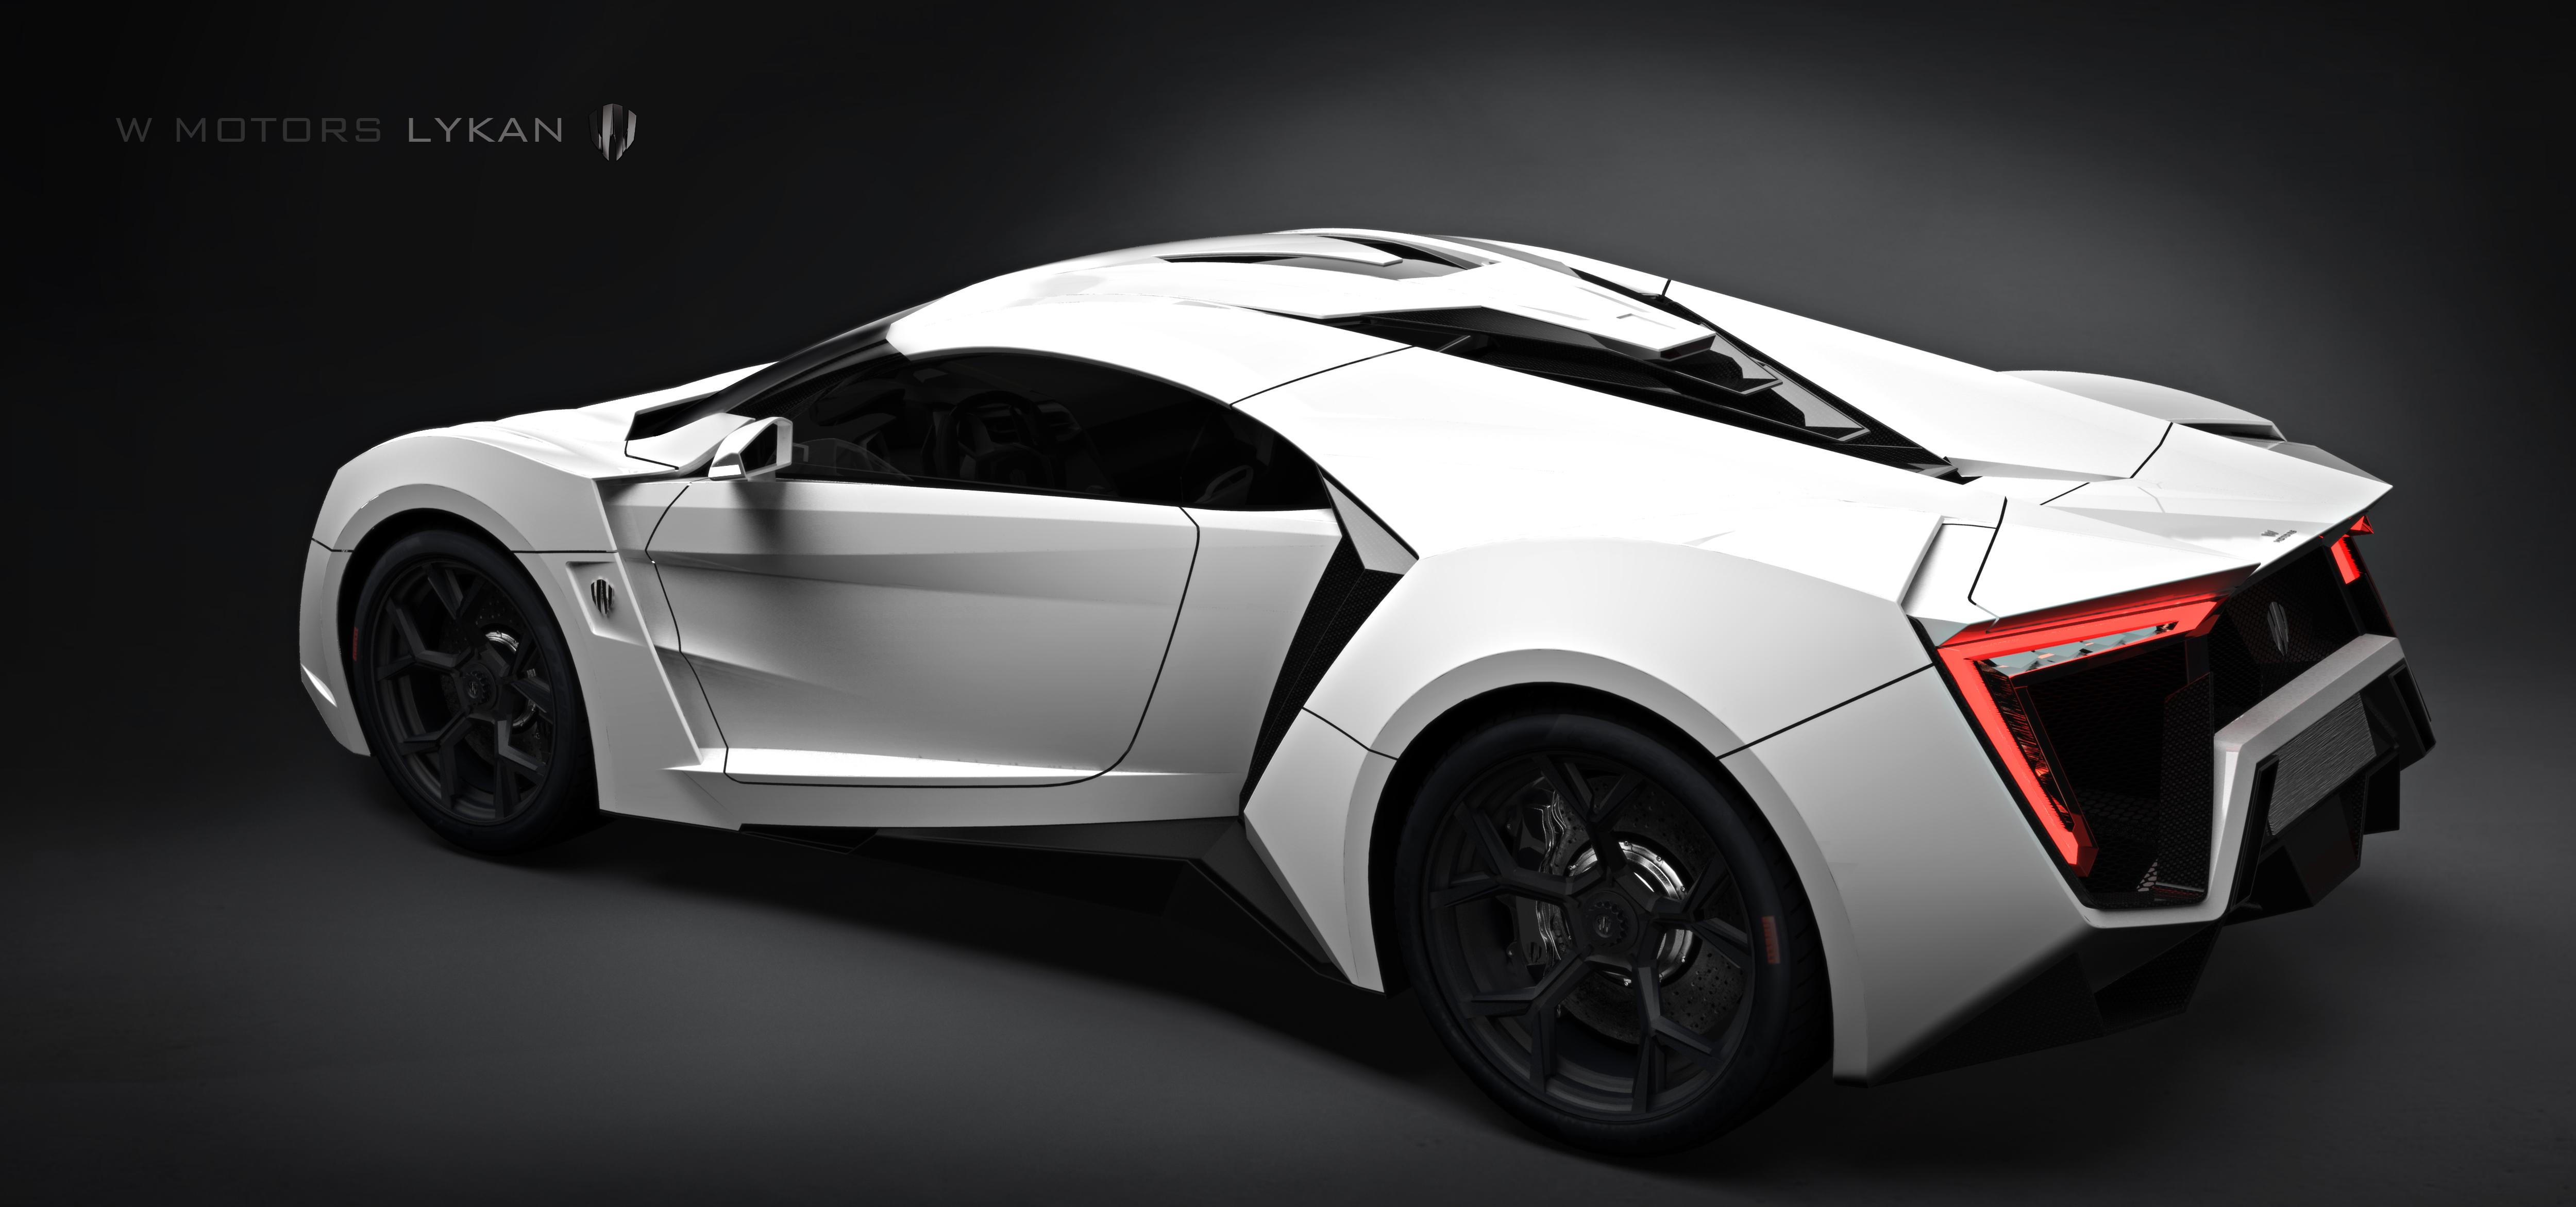 W Motors Lykan Hypersport 2013 - now Coupe #4